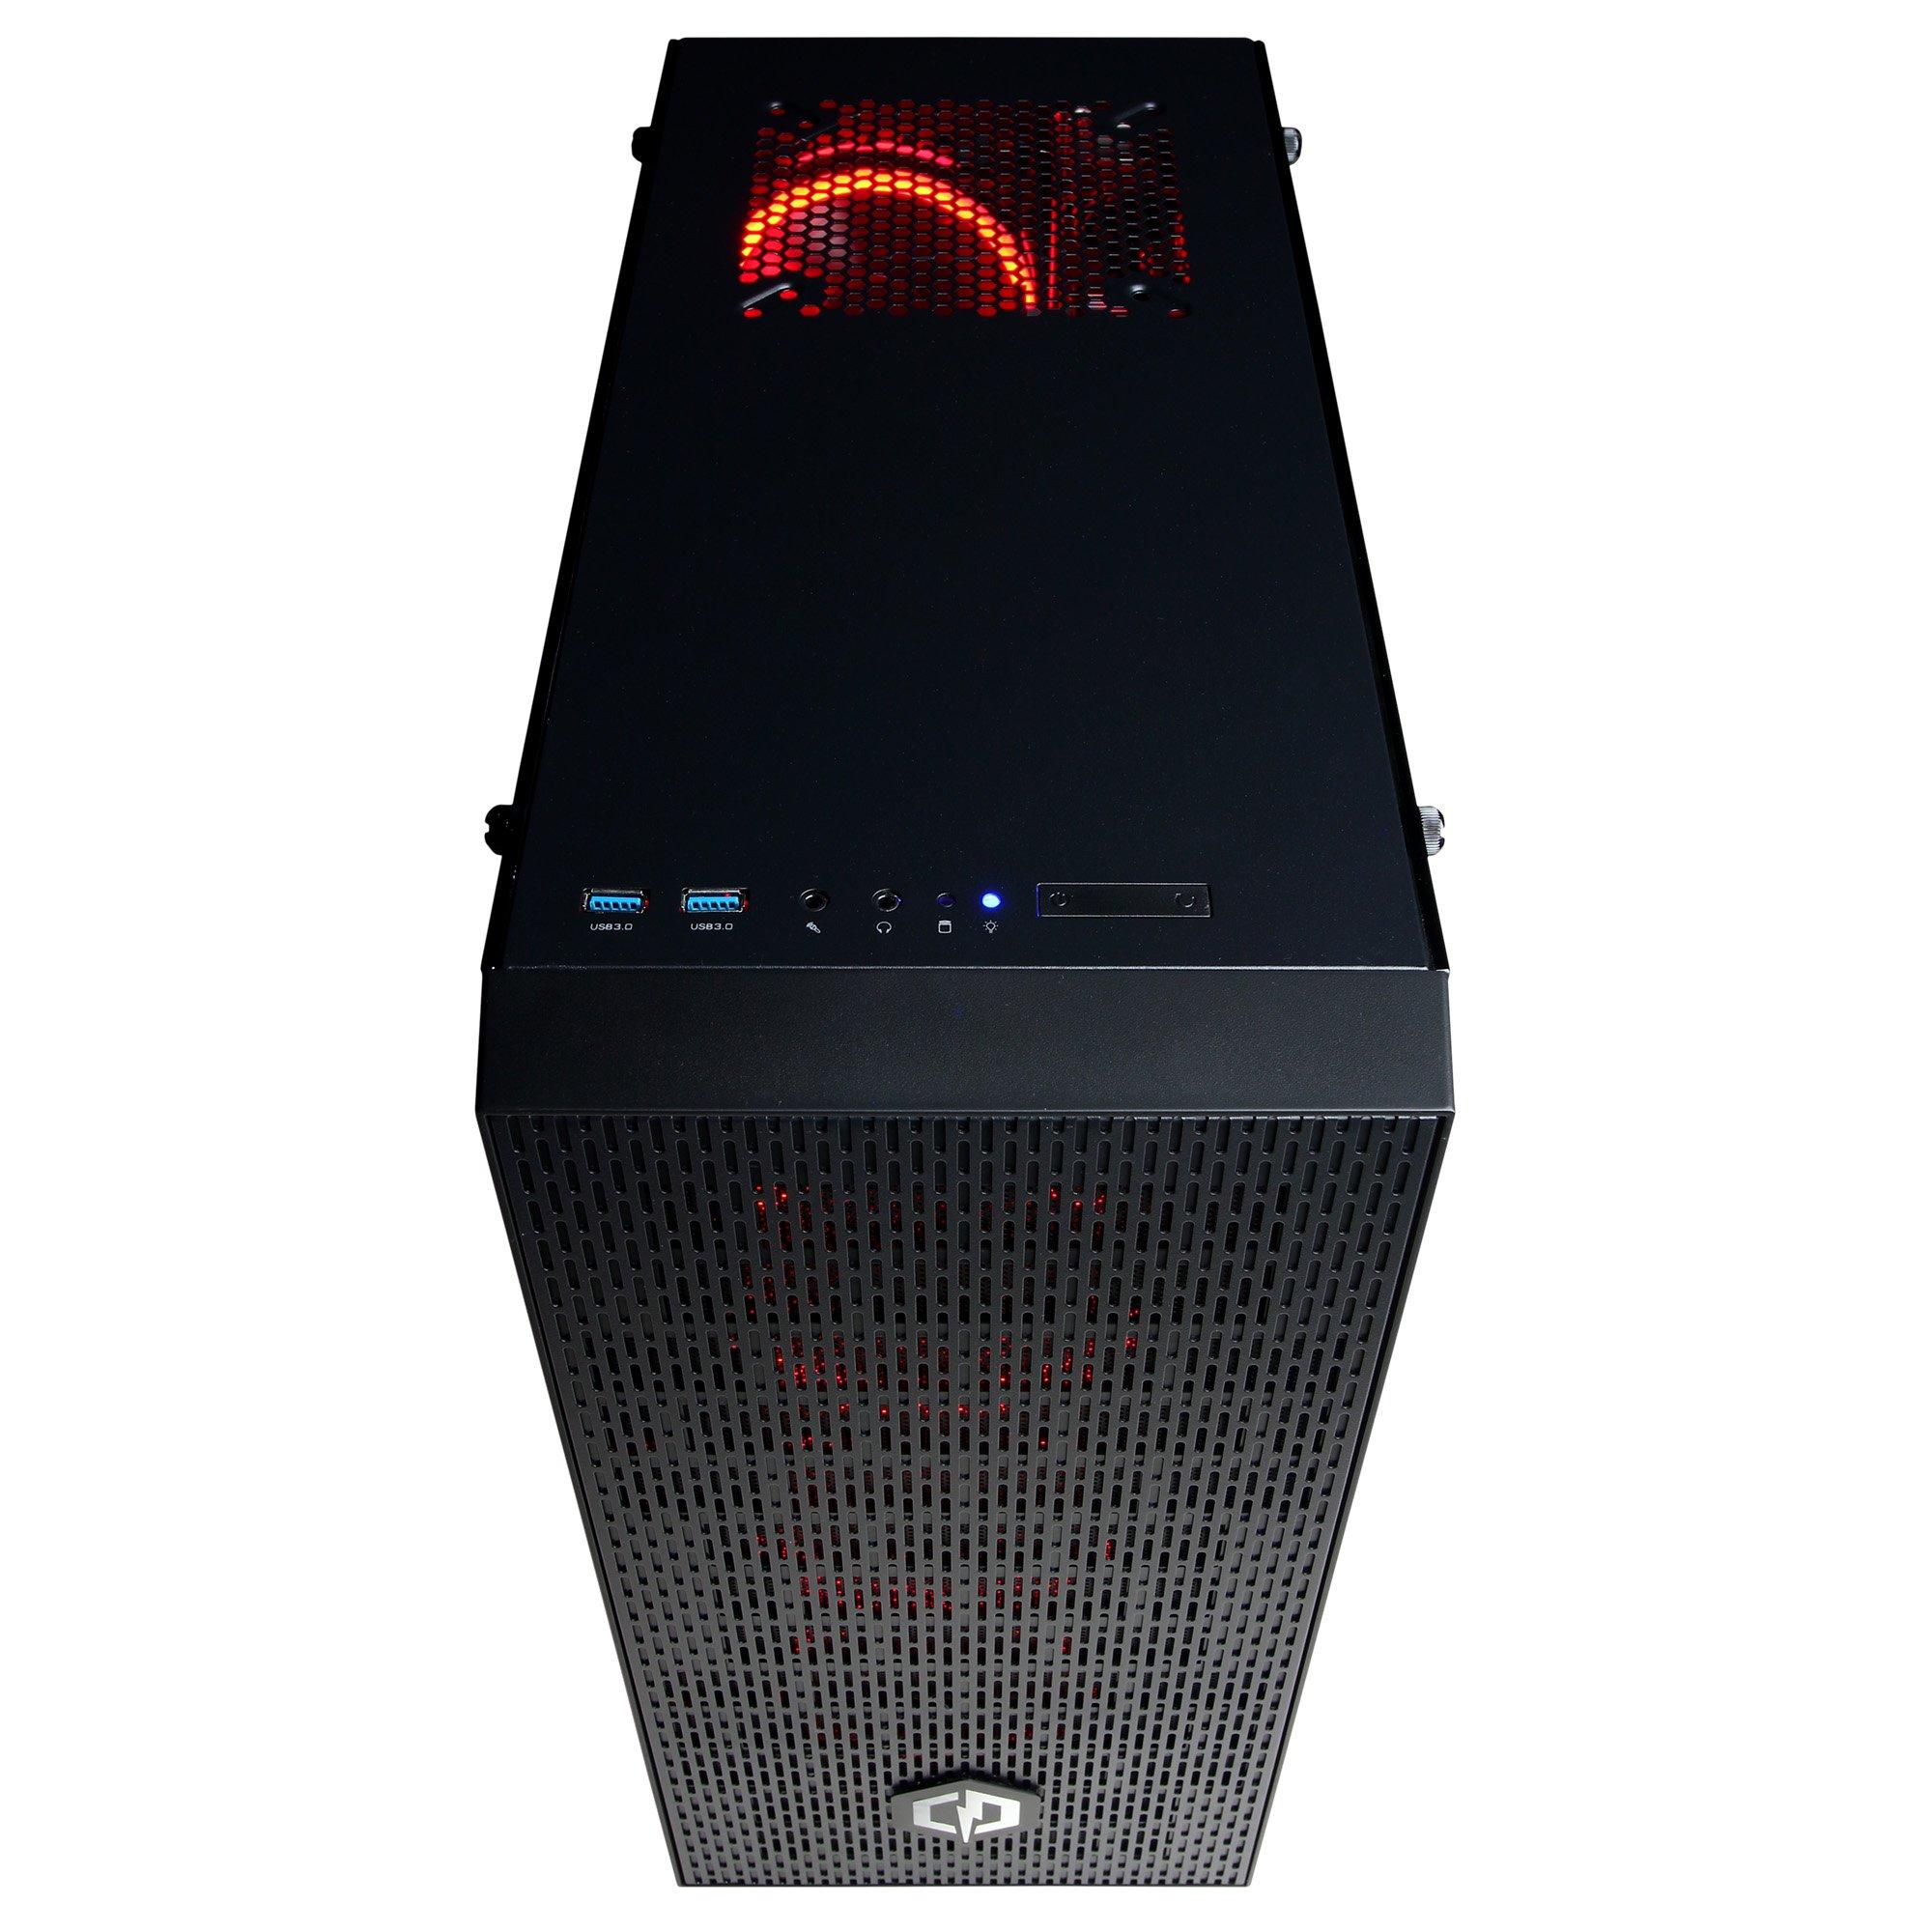 Gaming PC Desktop Computers   CyberPowerPC